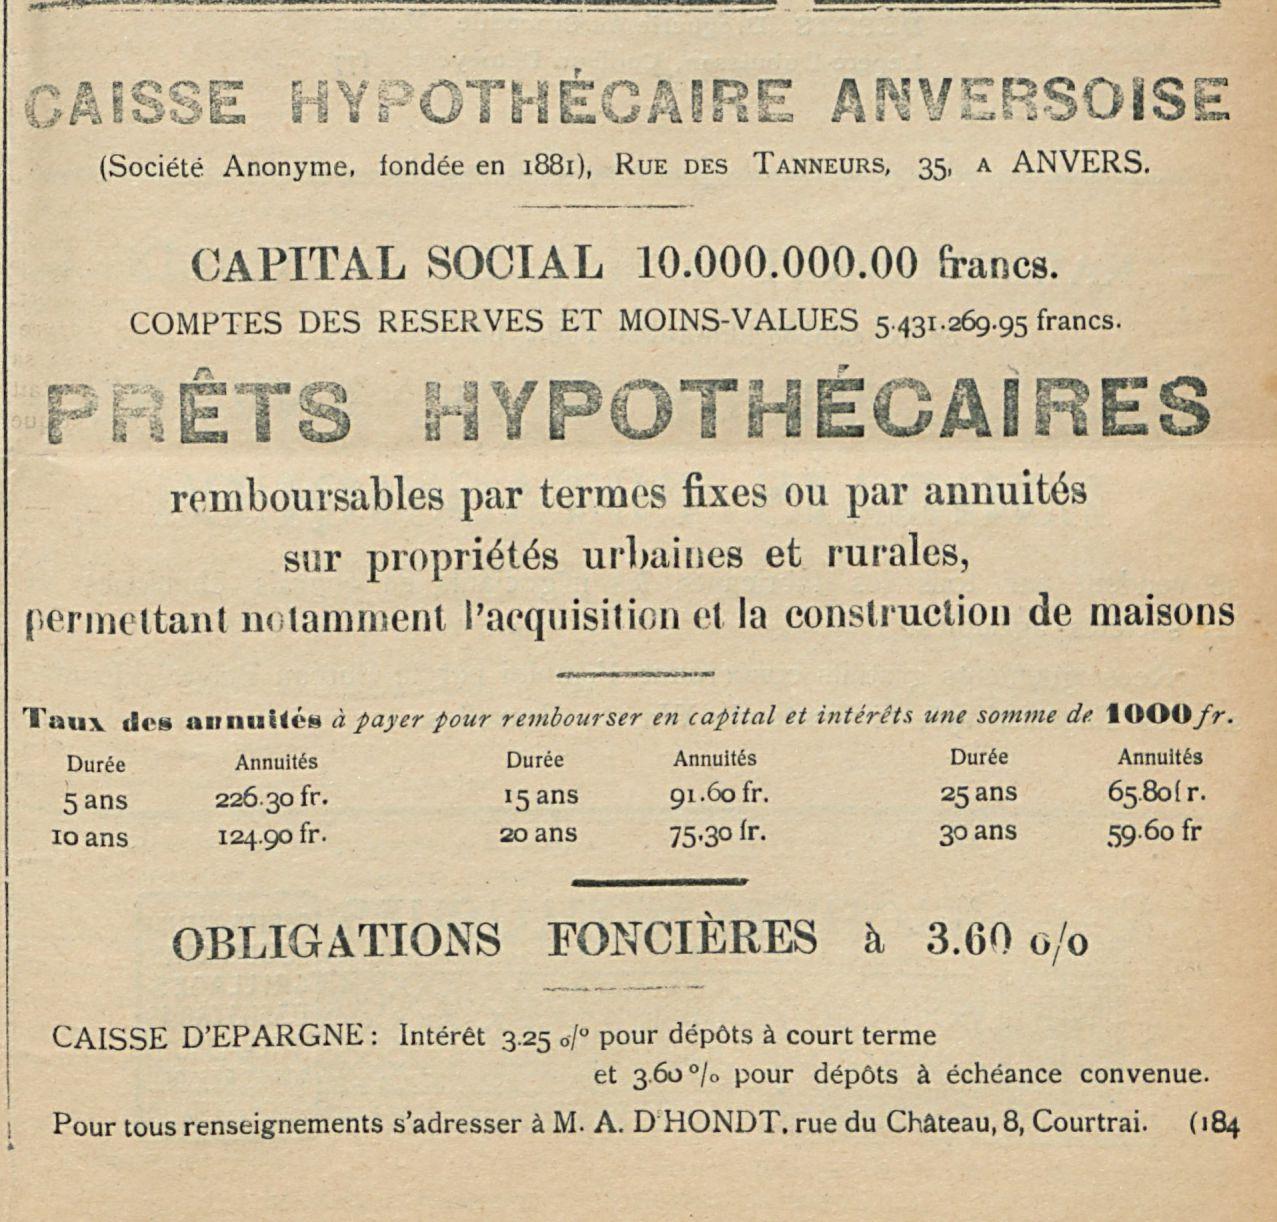 PRETS HYPOTHECAIRES